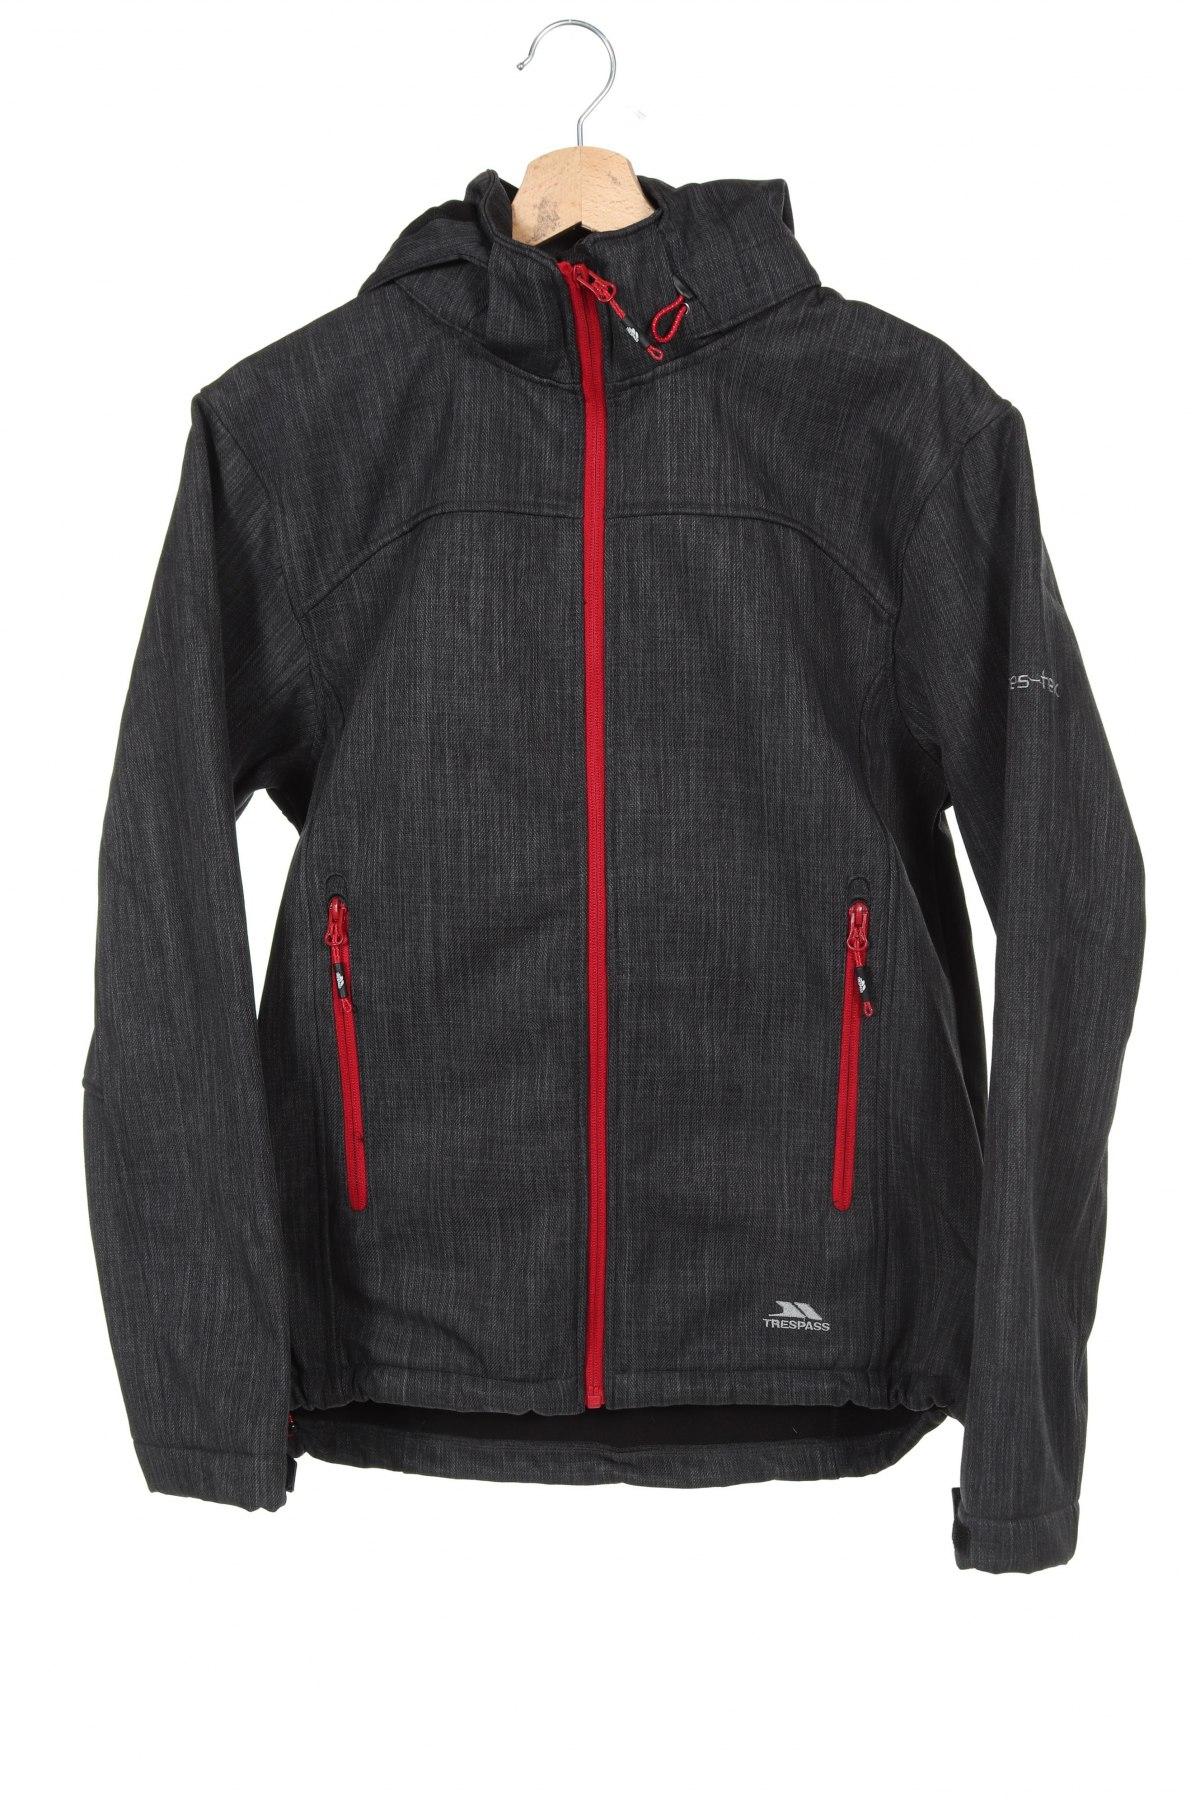 Мъжко спортно яке Trespass, Размер XS, Цвят Сив, Полиестер, Цена 93,96лв.